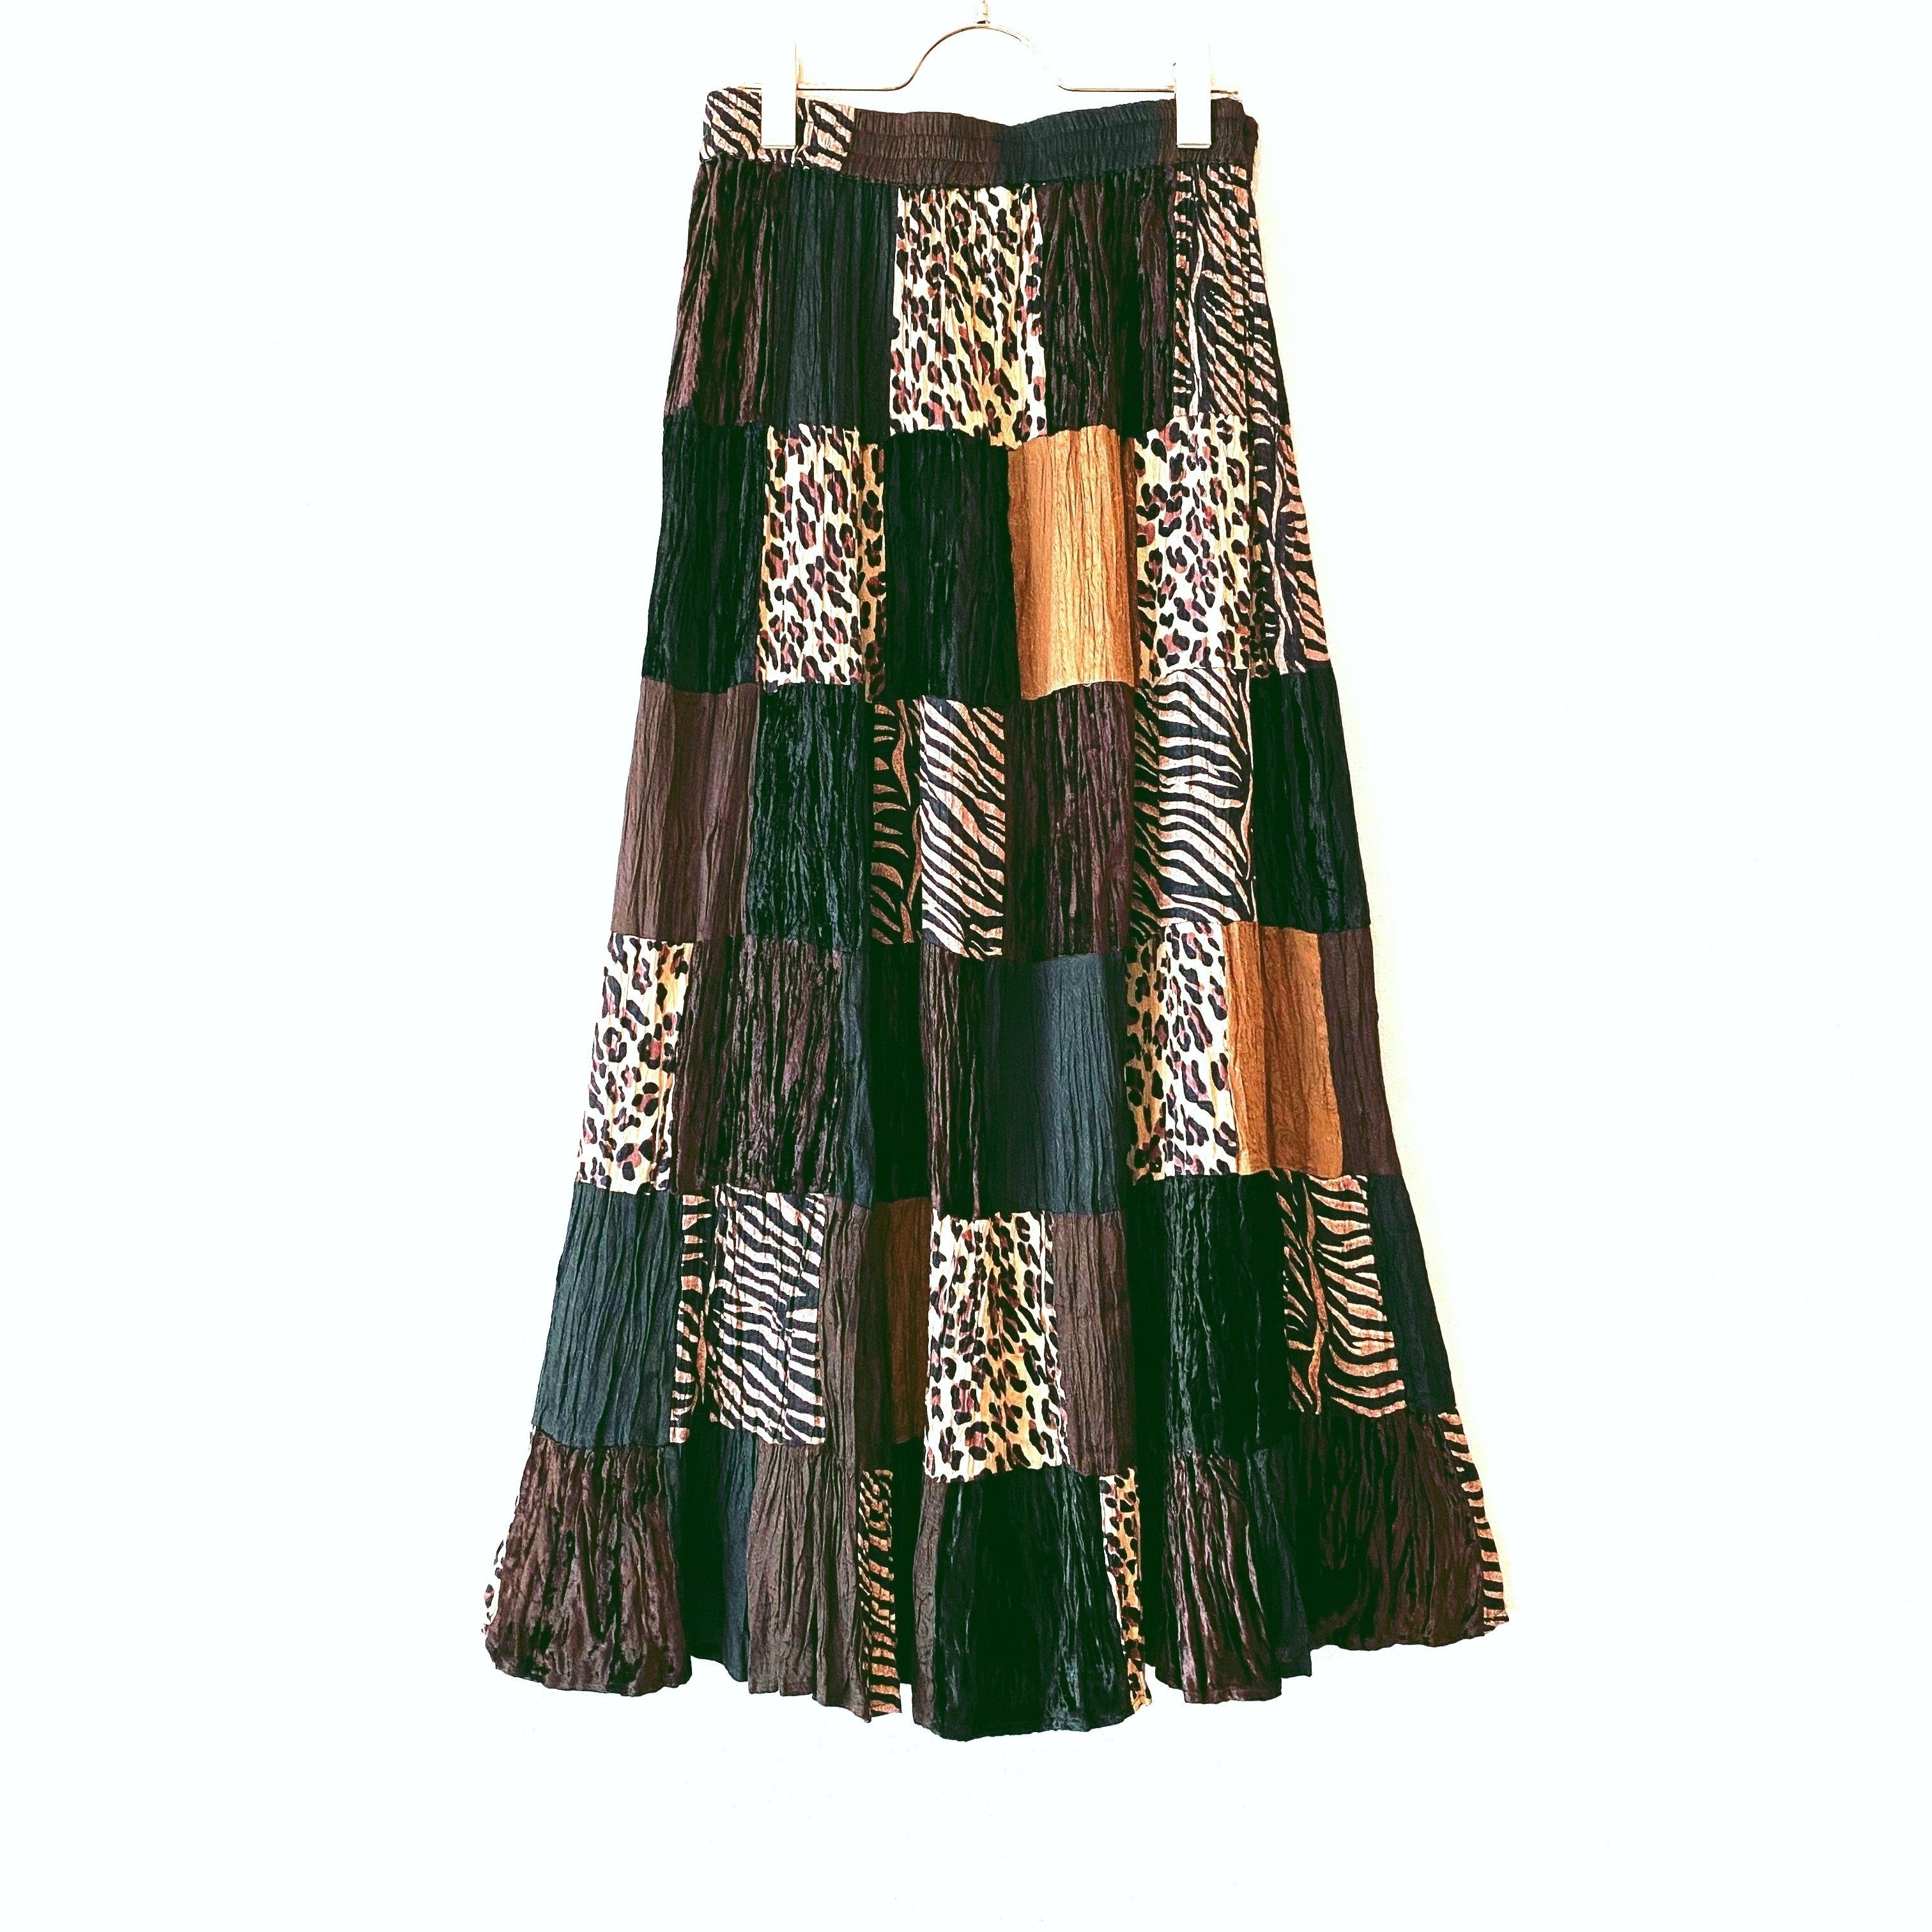 ◼︎80s vintage zebra × leopard patchwork skirt◼︎